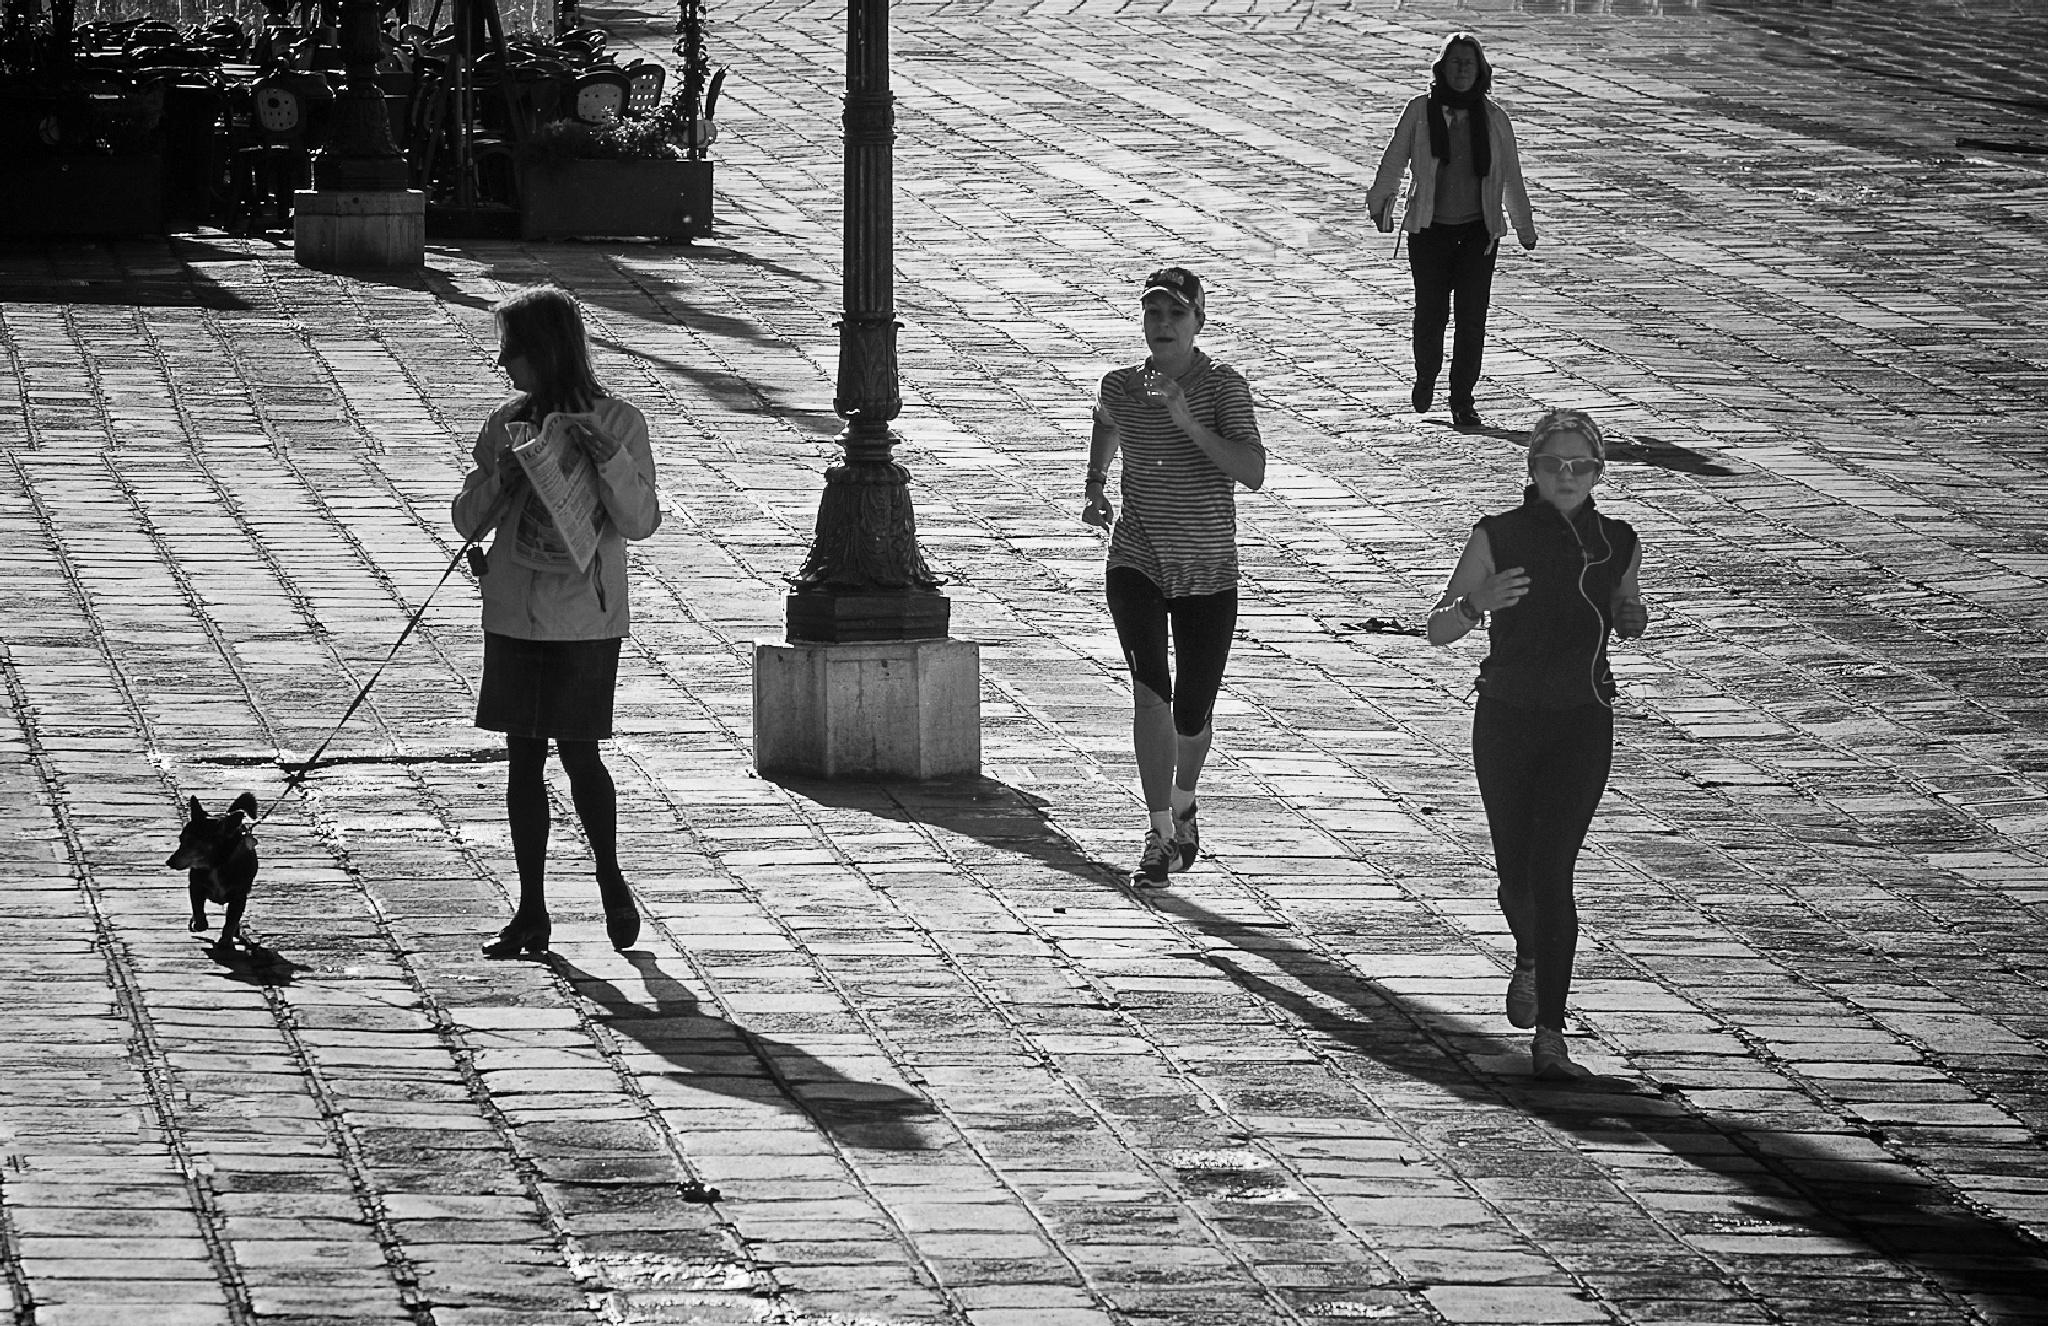 Footing à Venise by imnalavi